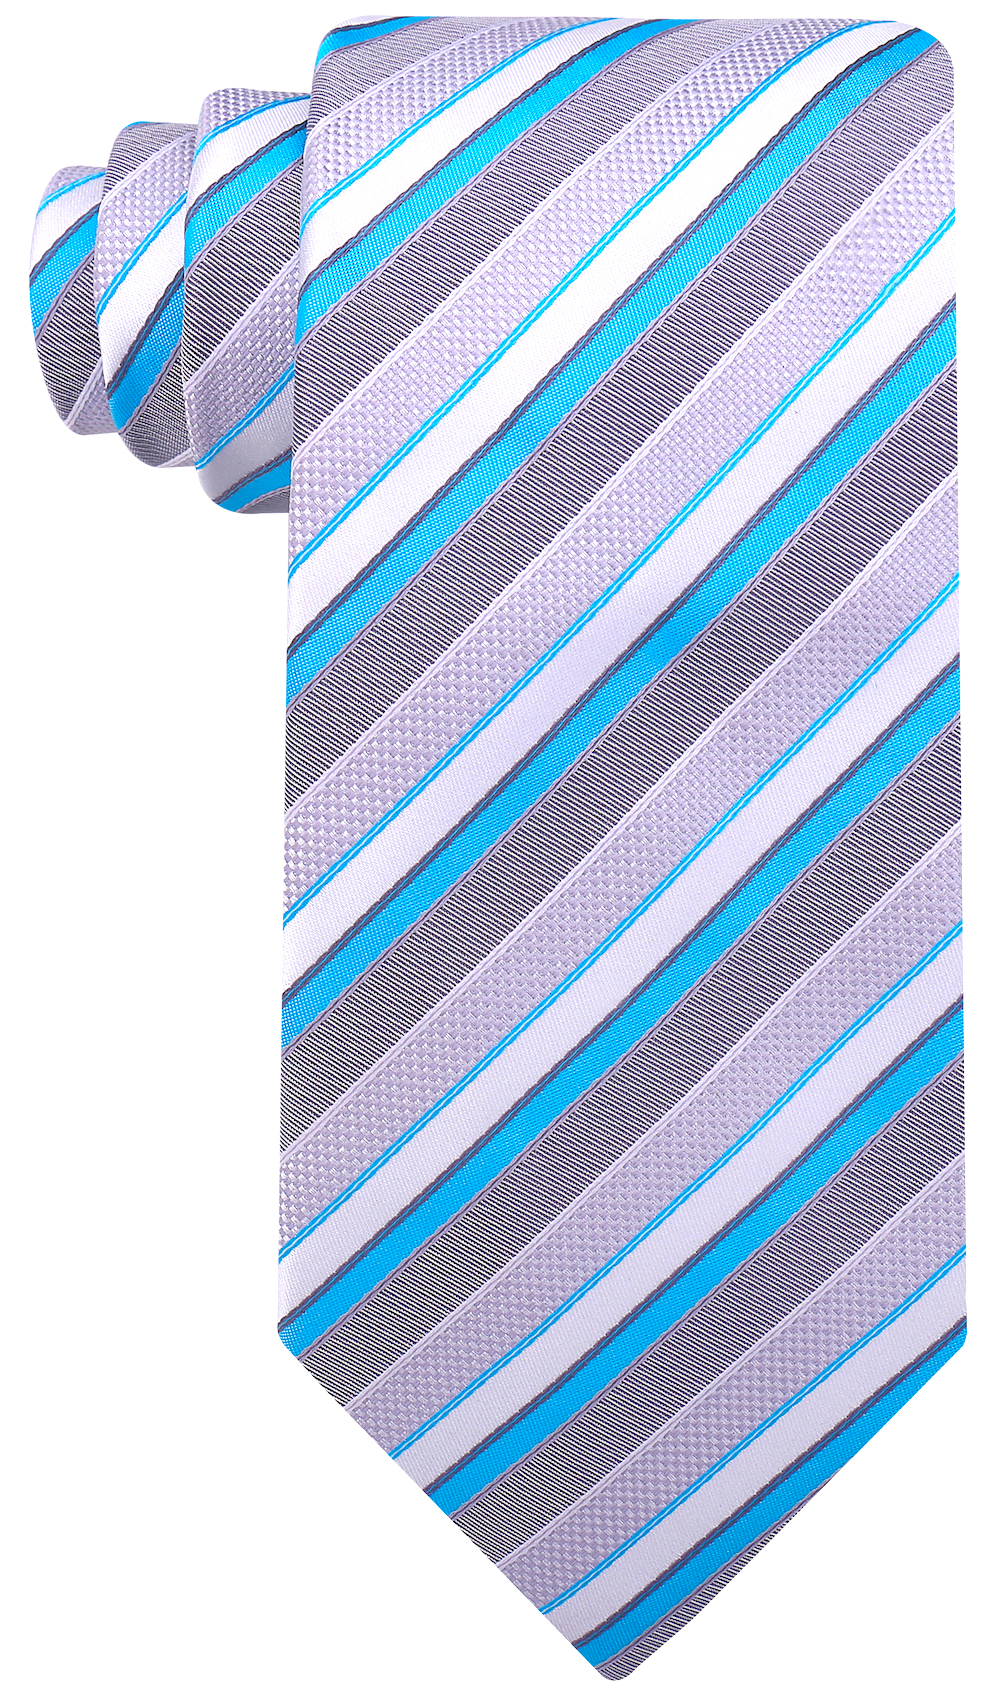 Scott-Allan-Striped-Necktie-Mens-Ties-in-Various-Colors thumbnail 34